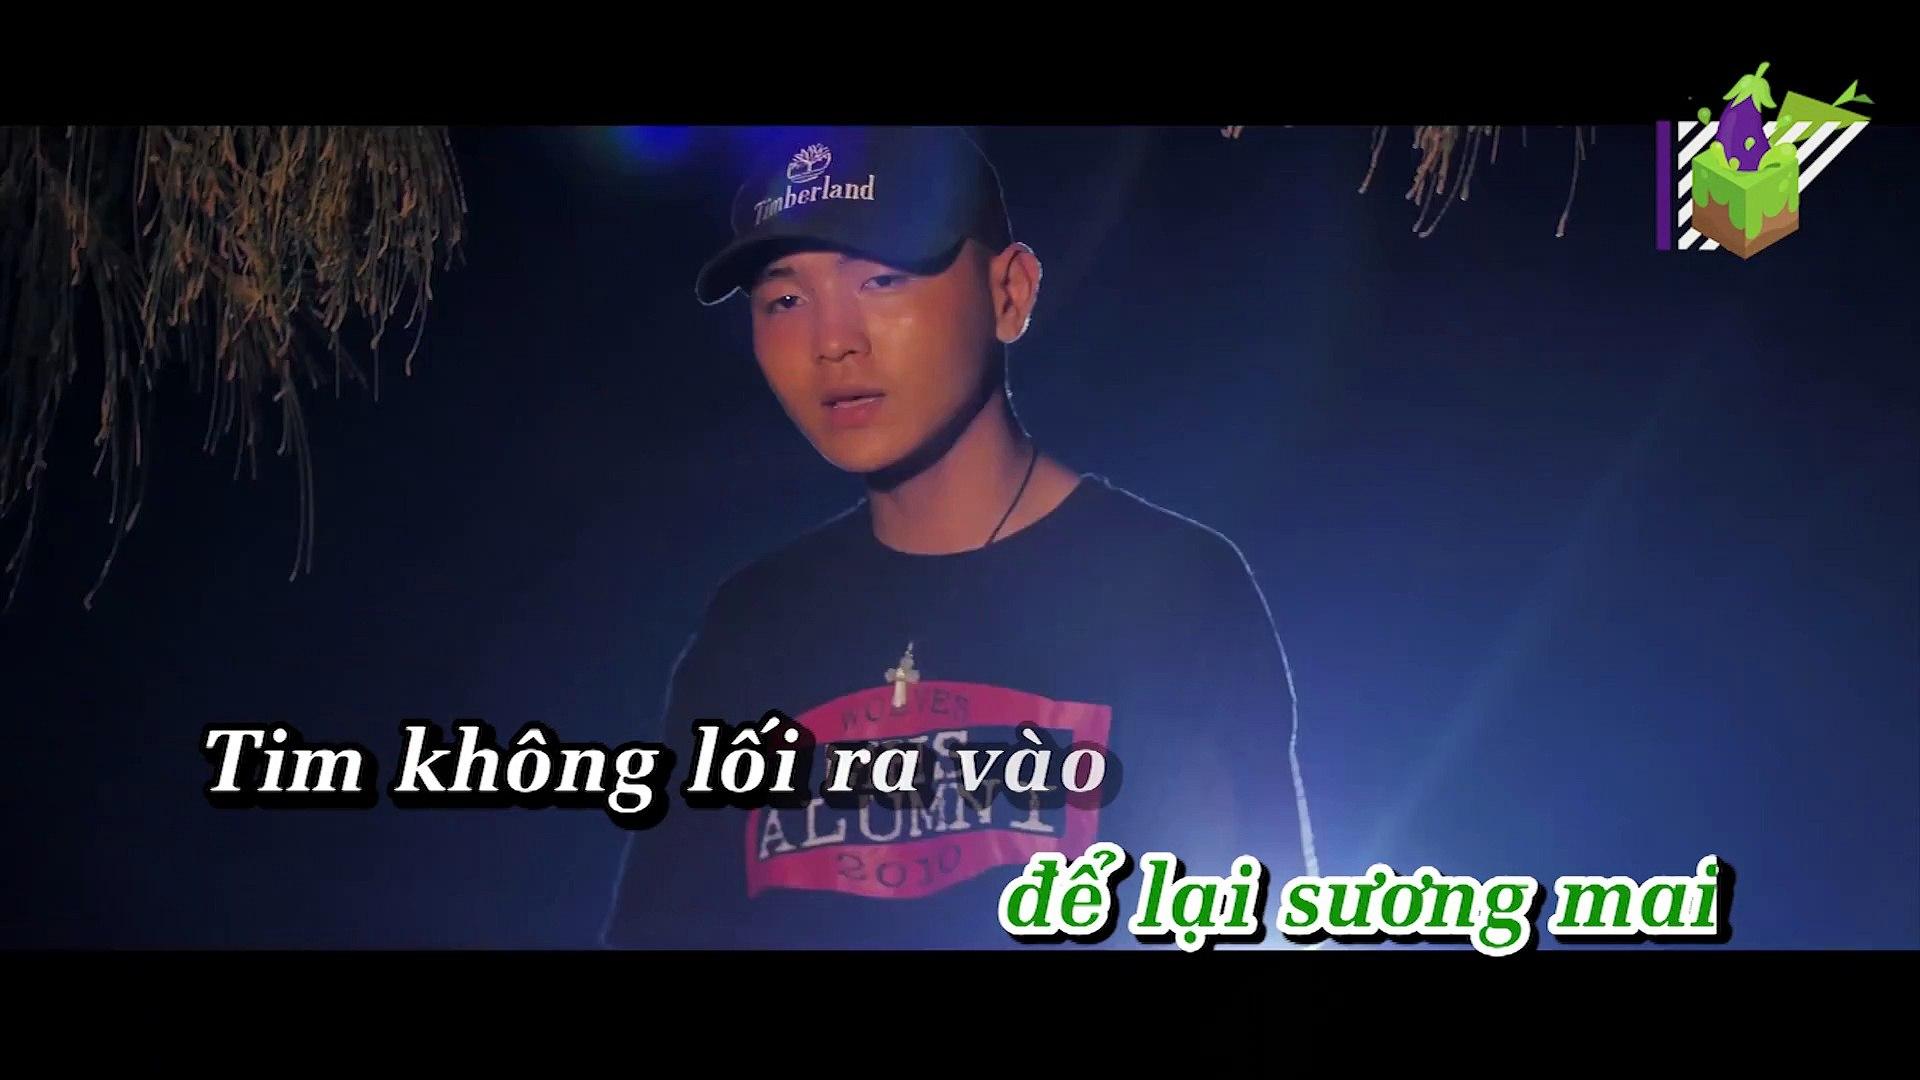 [Karaoke] Liệu Giờ - 2T Ft. Văn [Beat]